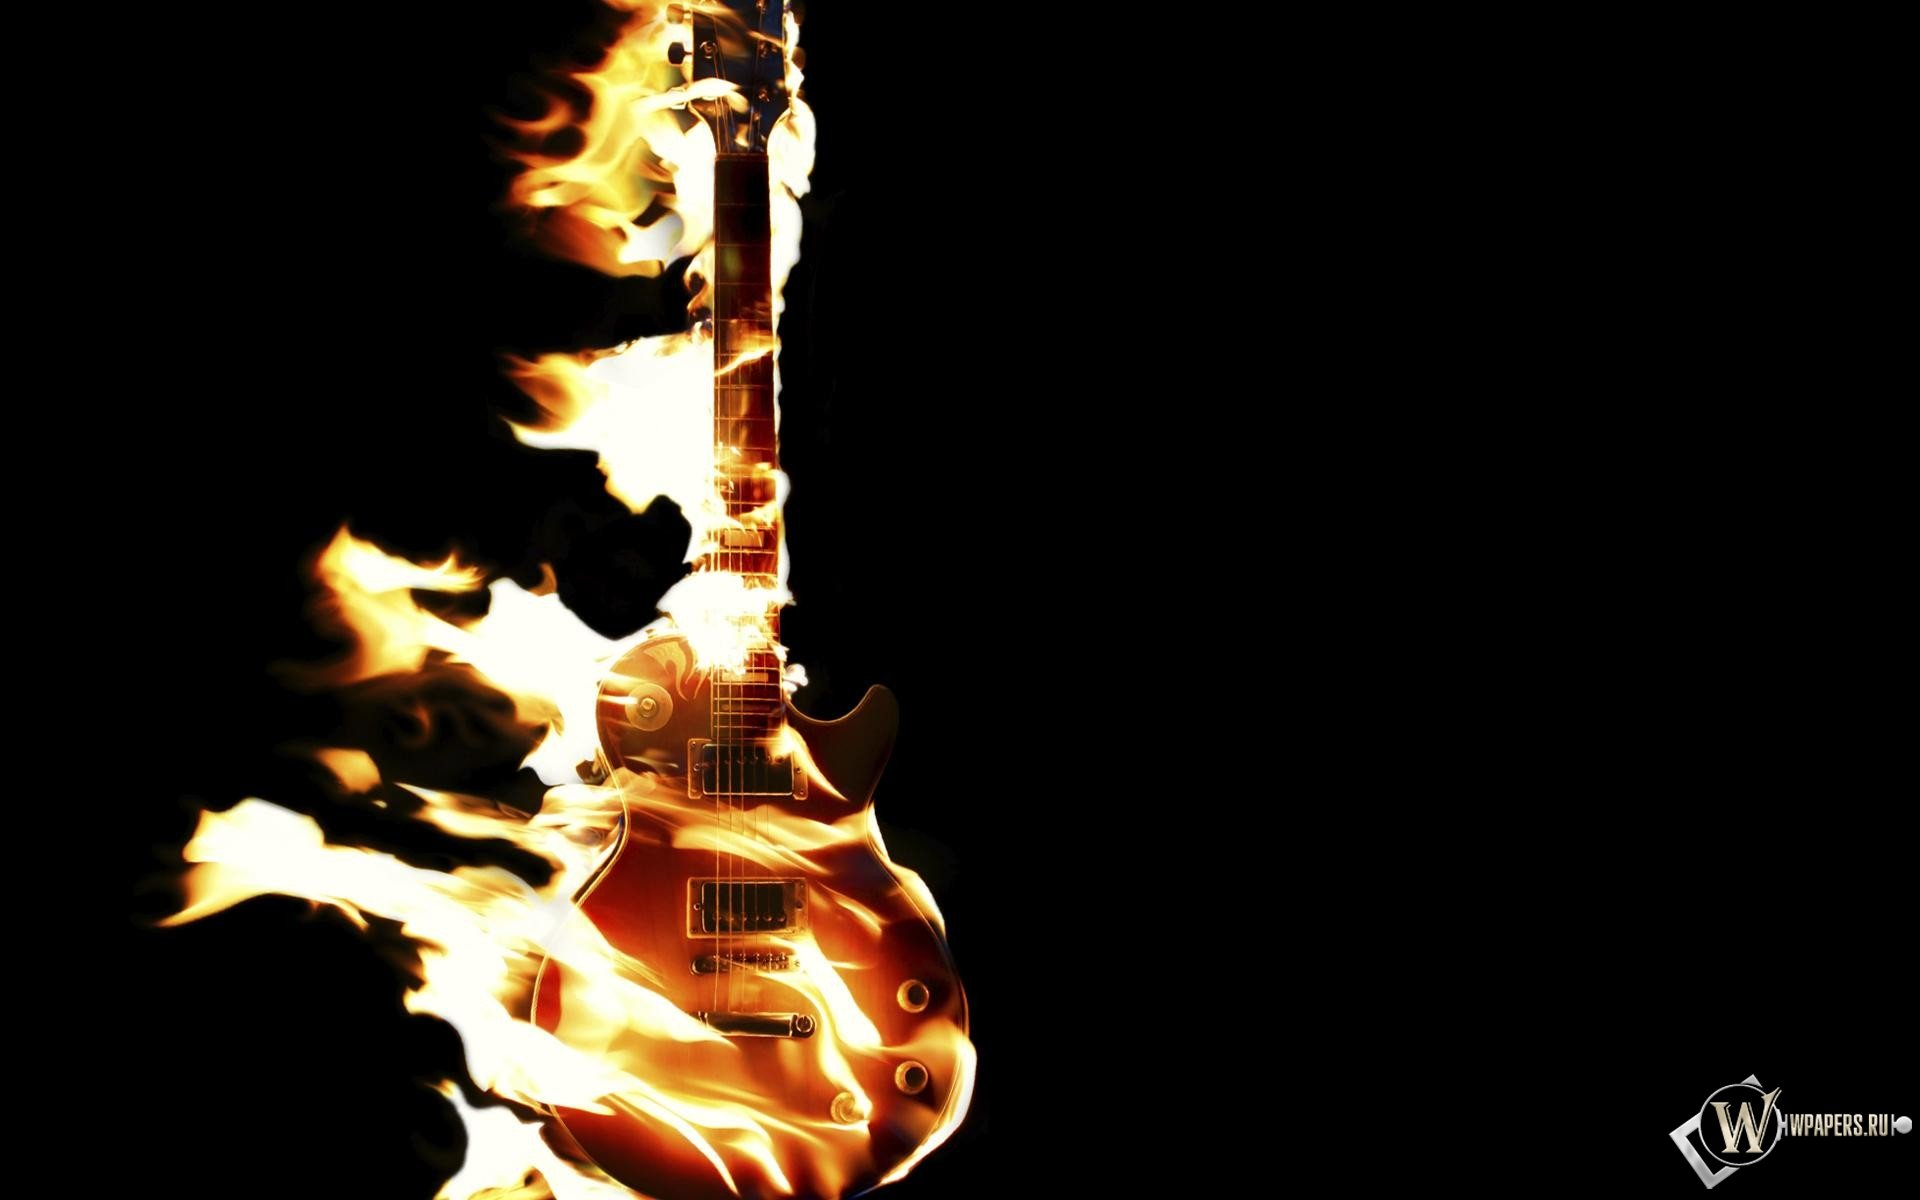 Abstract Guitar Wallpaper Hd: Burning Guitar HD Wallpaper